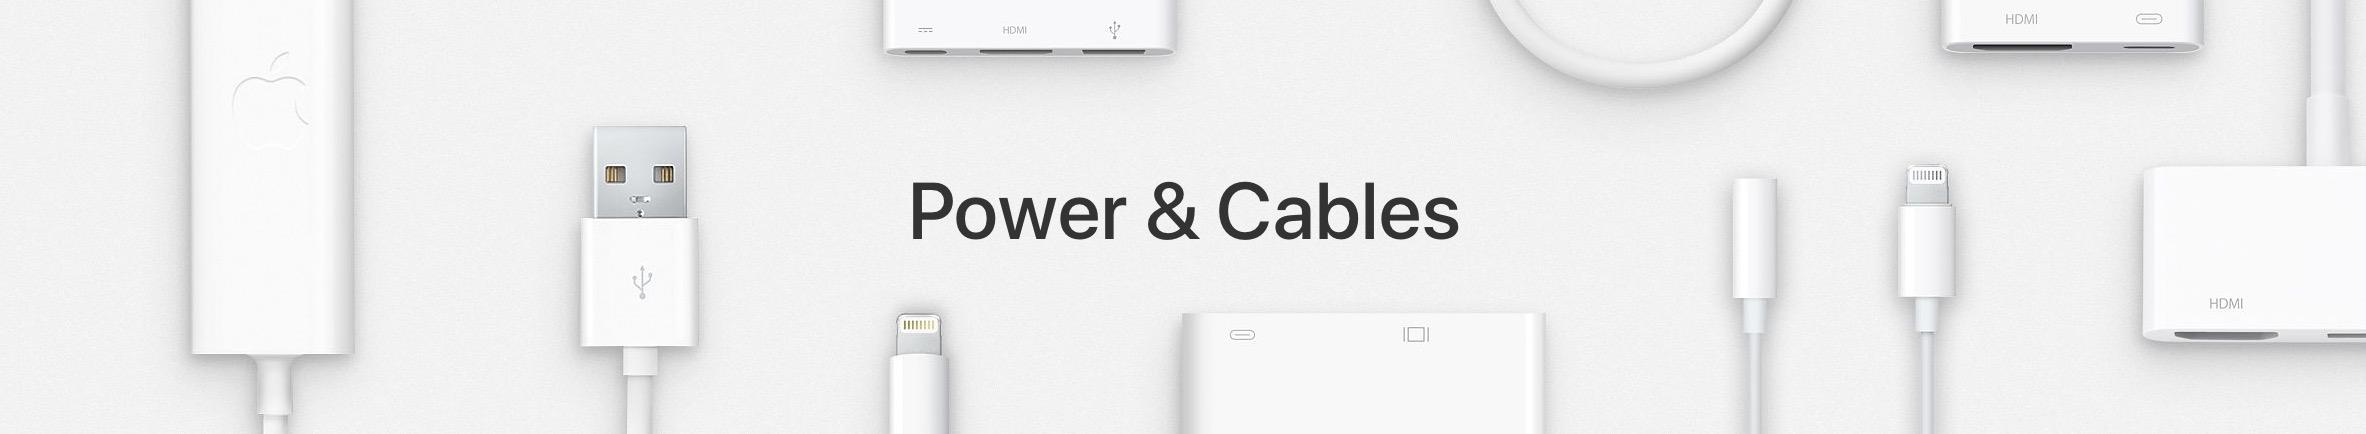 Sạc nhanh iPhone iPad bằng bộ sạc MacBook?